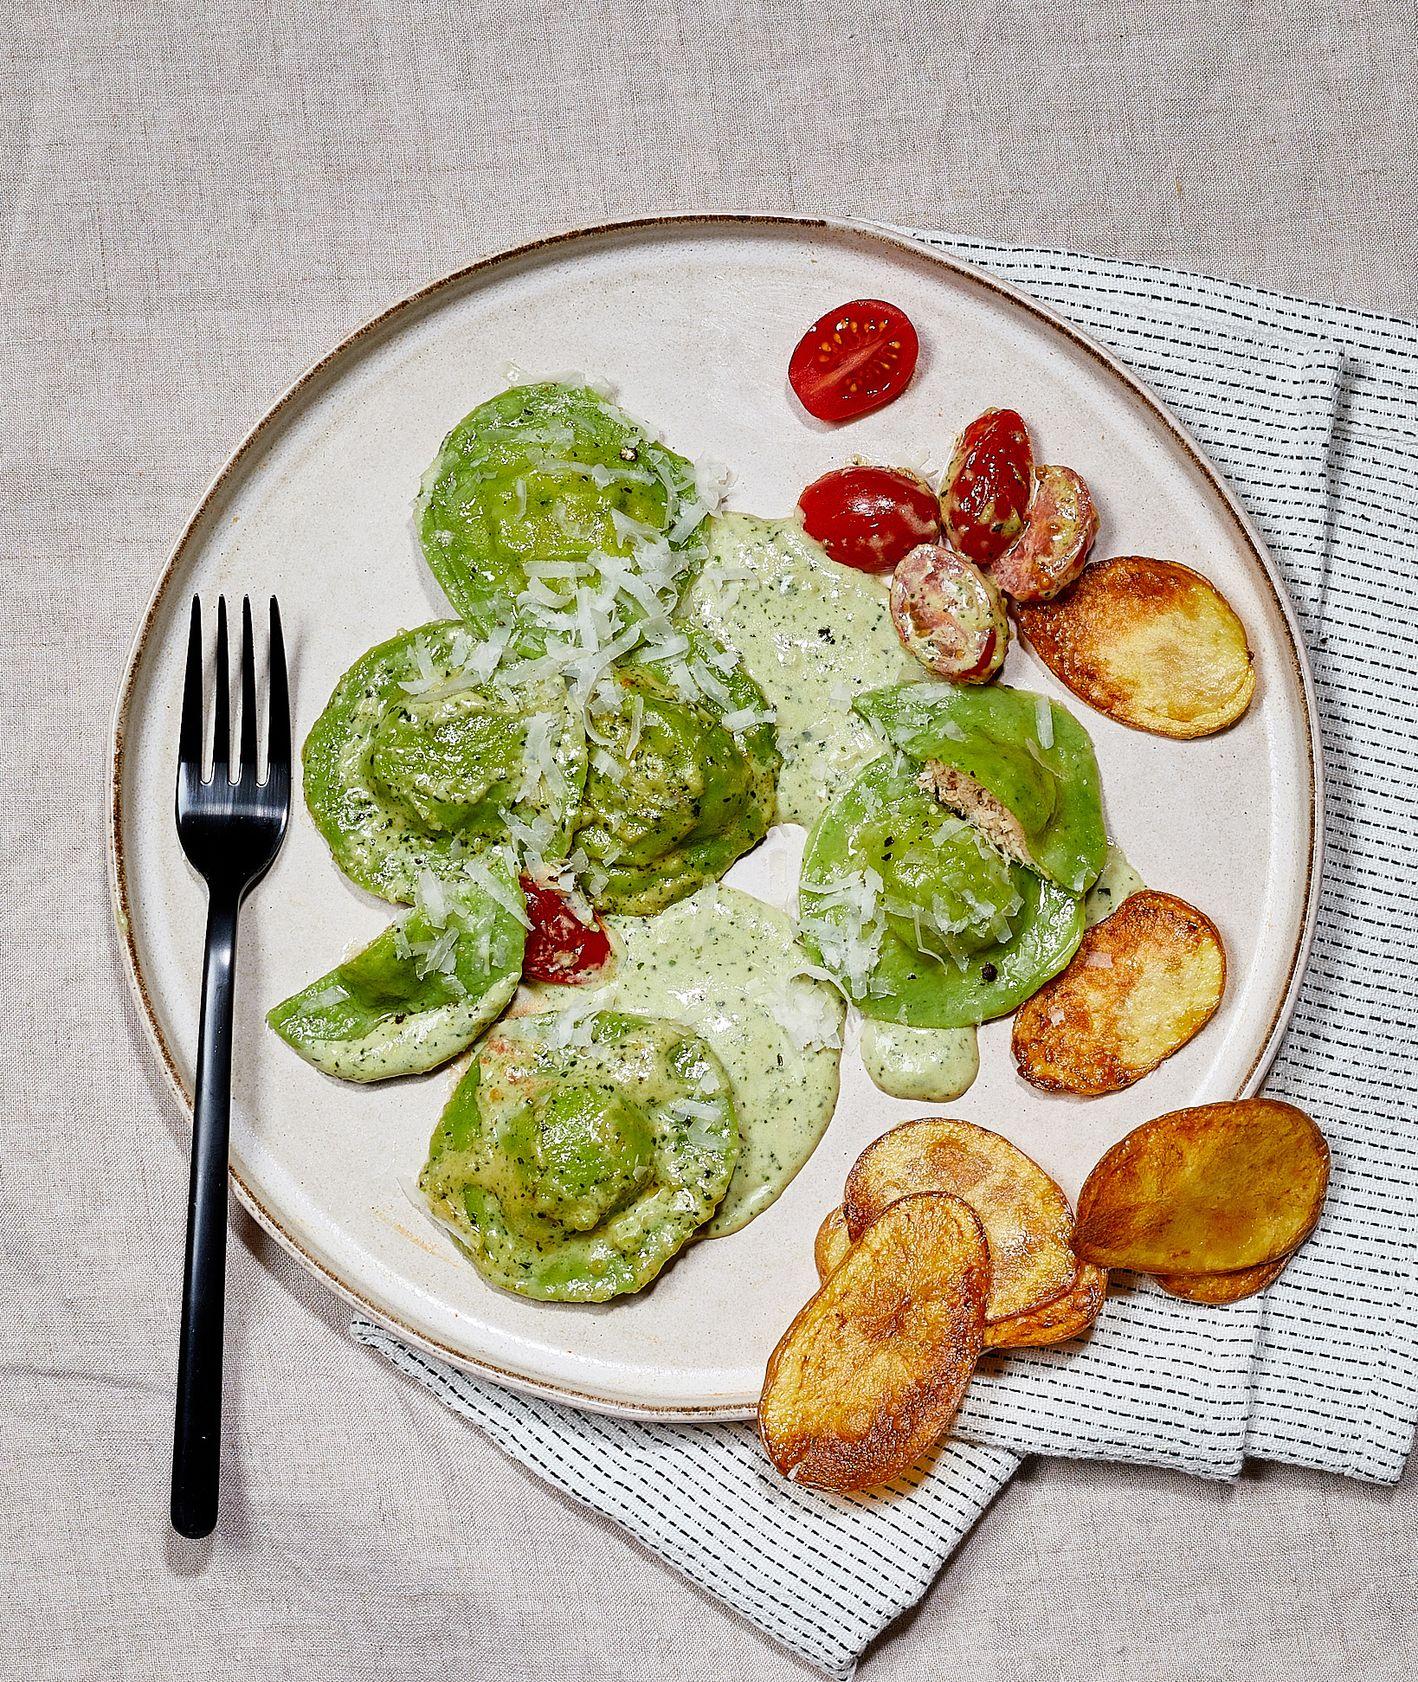 Ravioli szpinakowe z kurczakiem, sosem pesto z pomidorkami i chipsami z topinamburu. Wermut. (fot. Maciek Niemojewski)